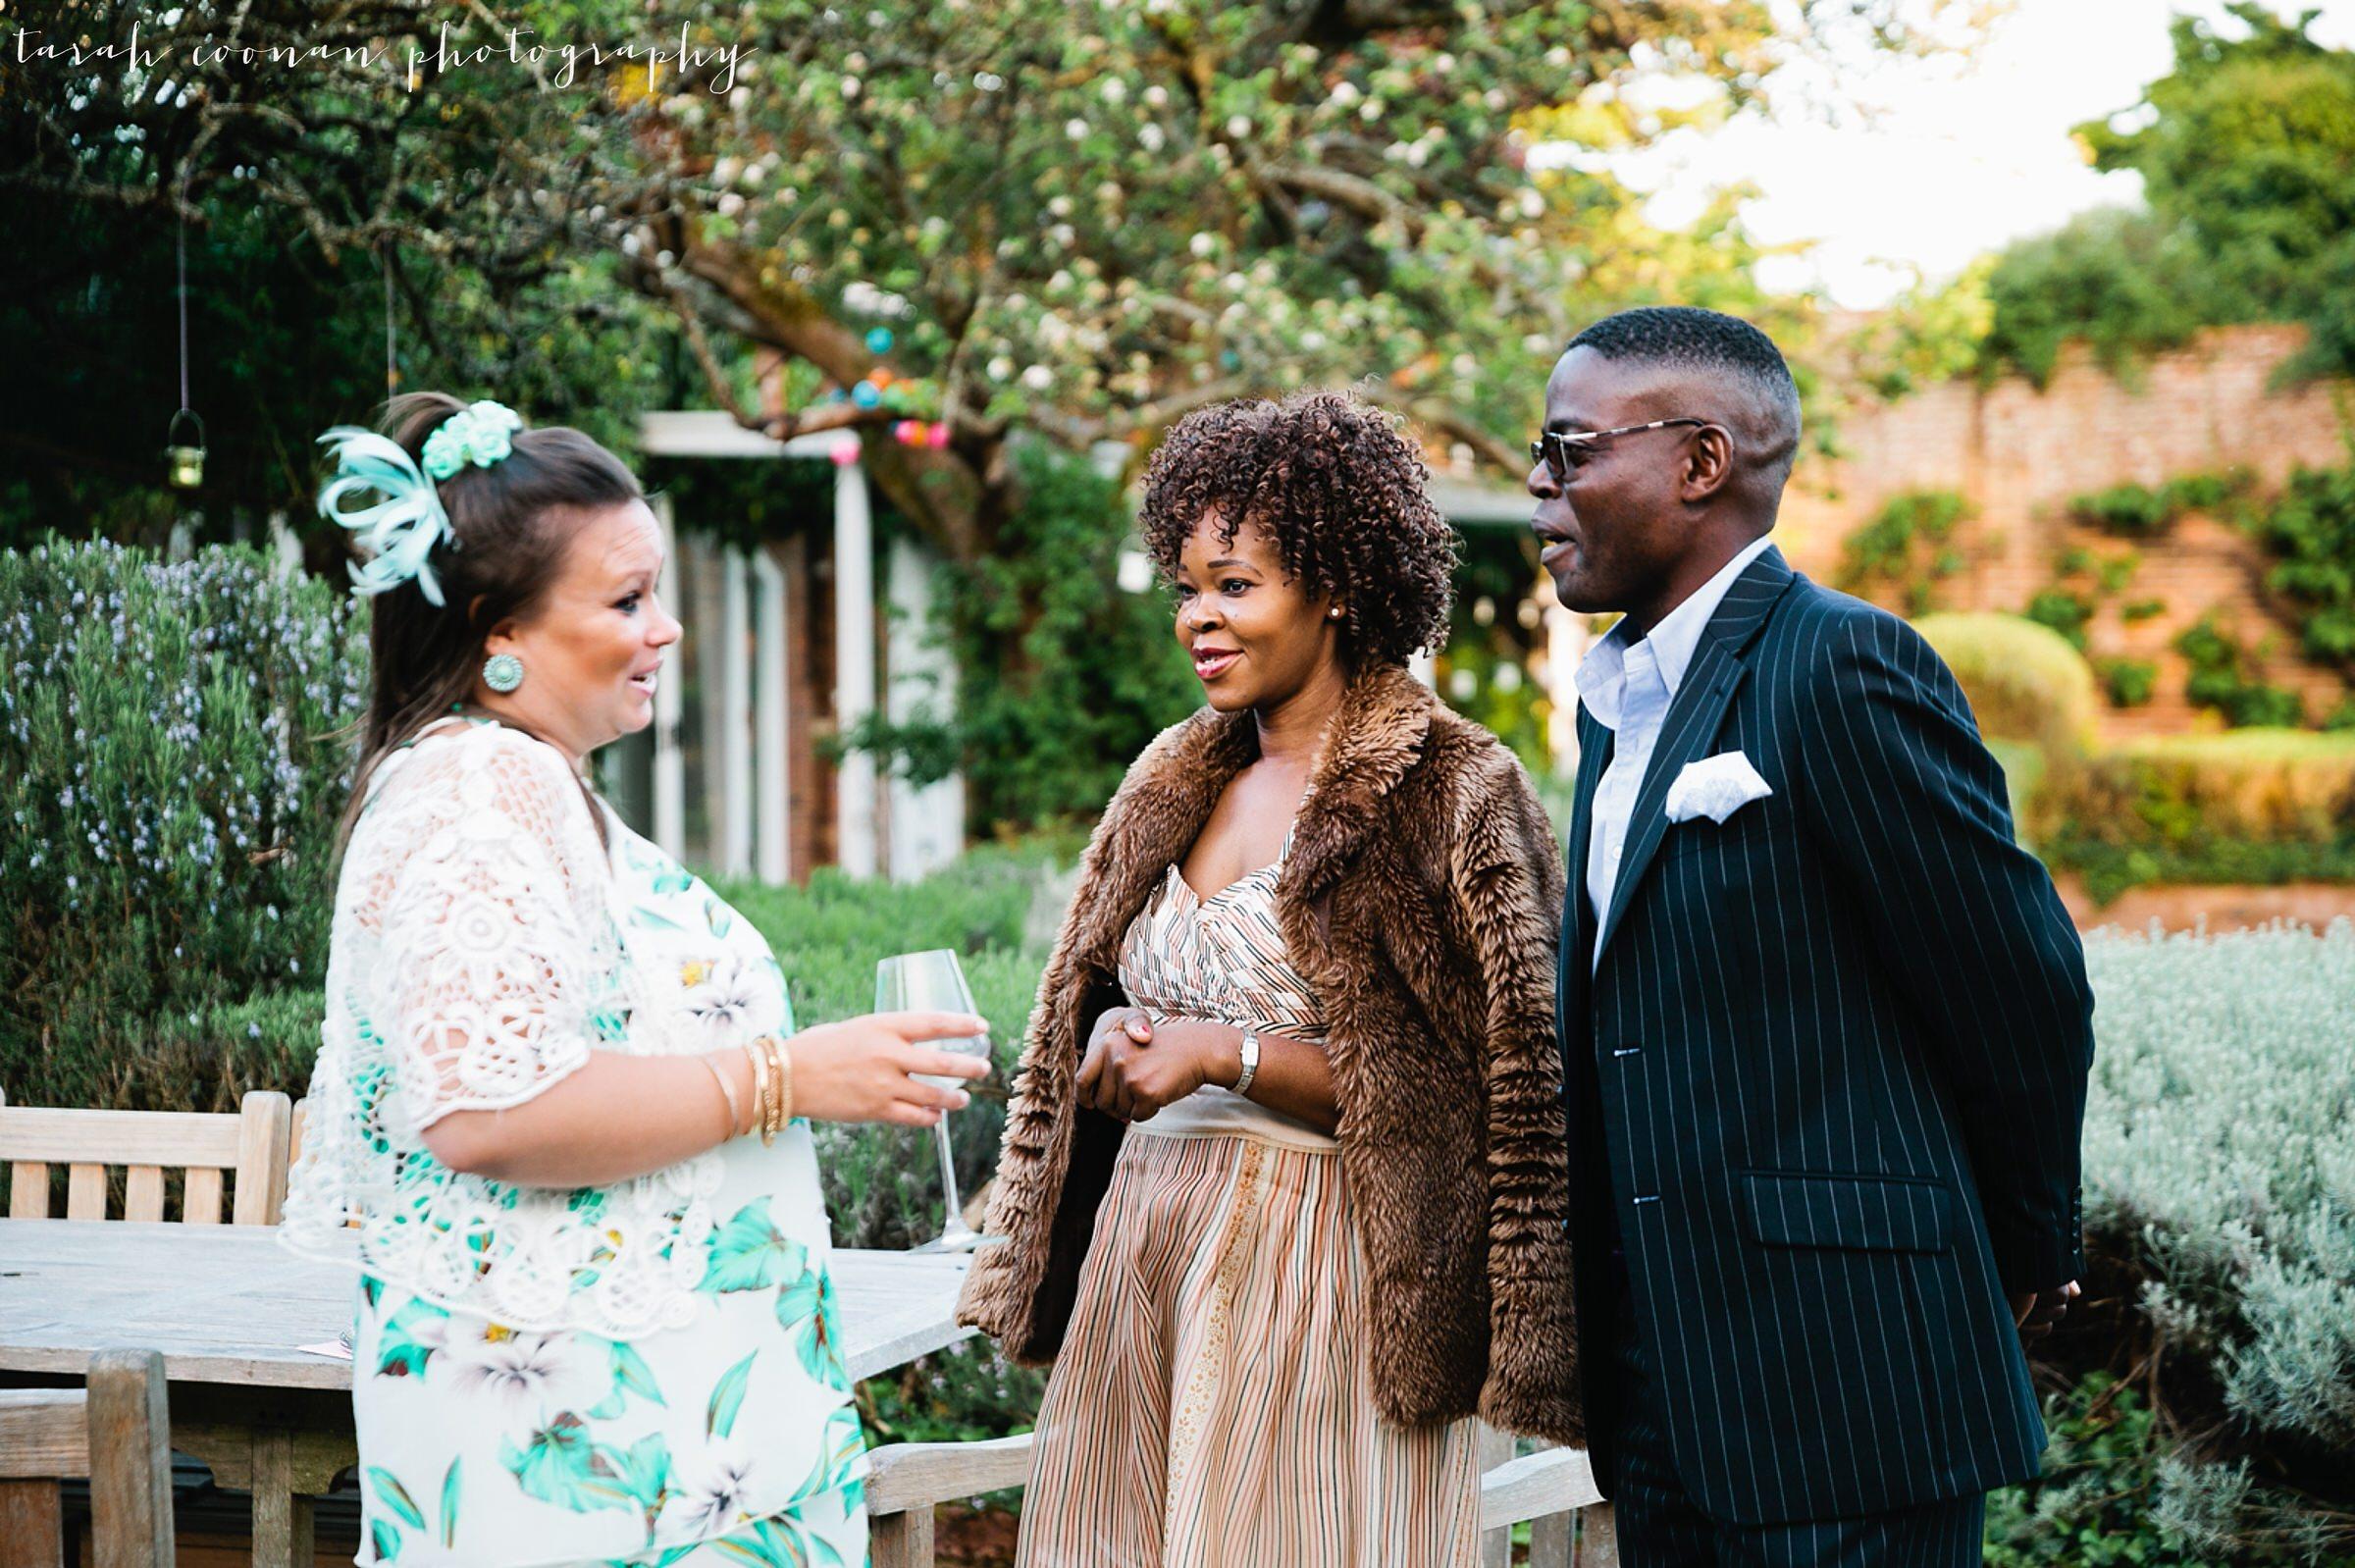 northbrook-park-wedding-photographer_092